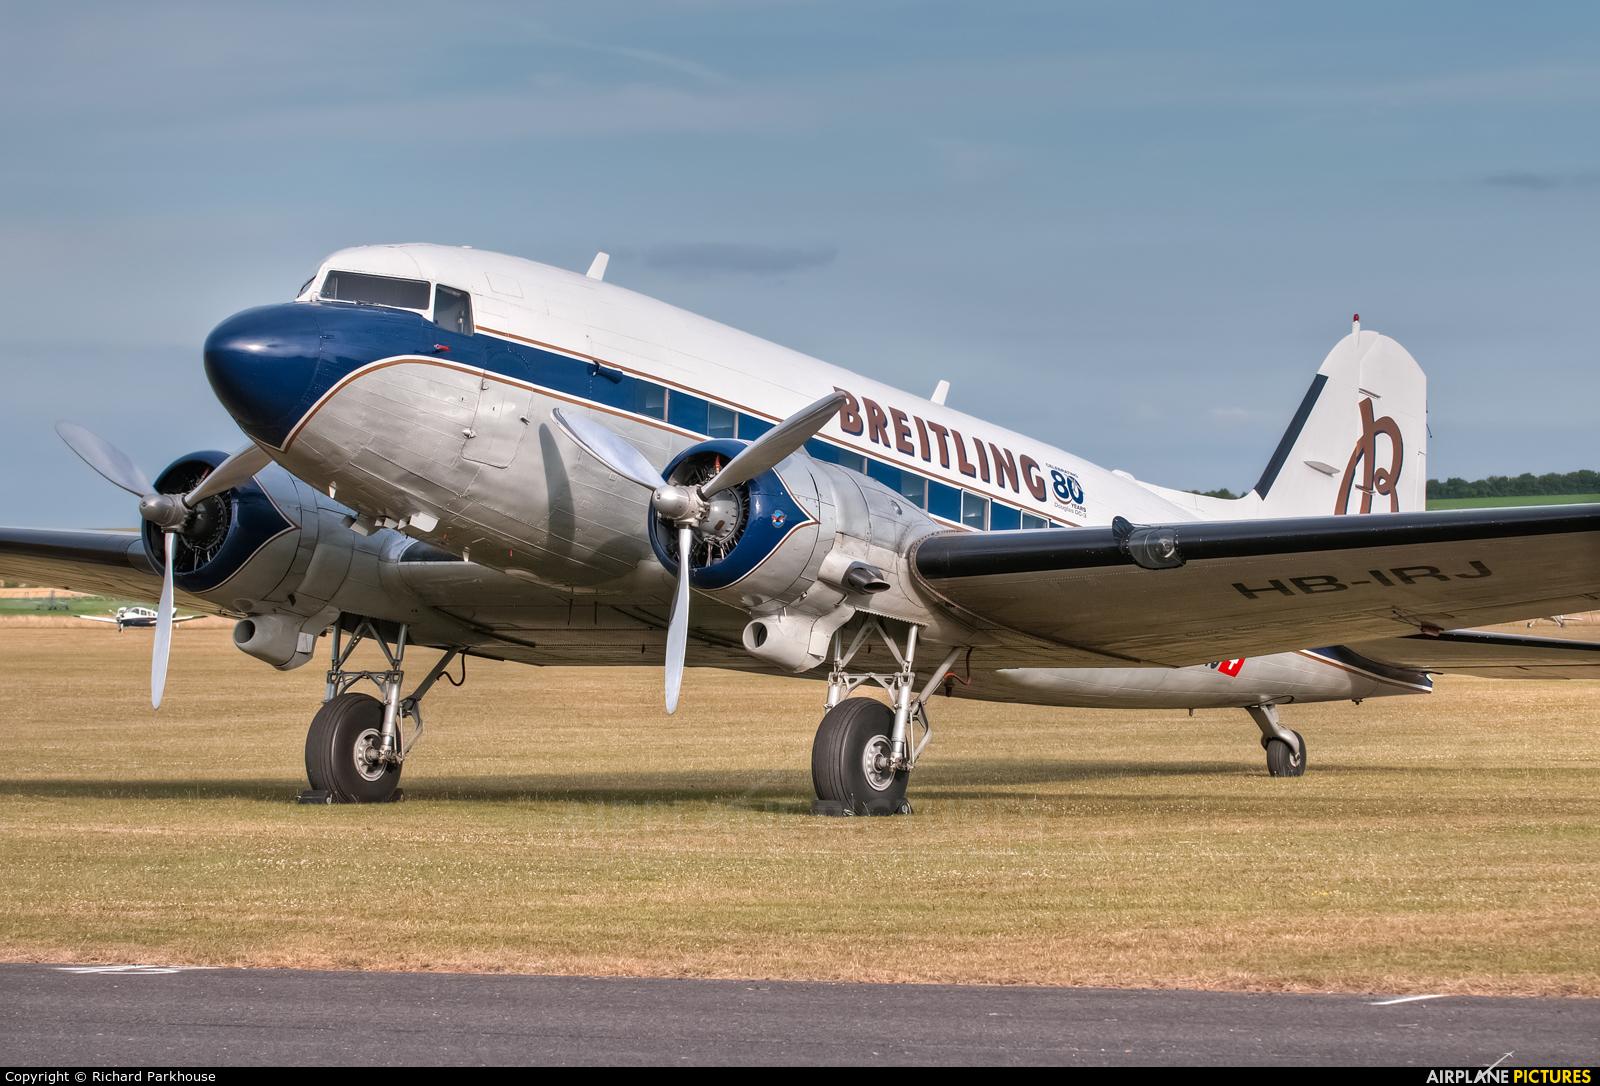 Super Constellation Flyers HB-IRJ aircraft at Duxford